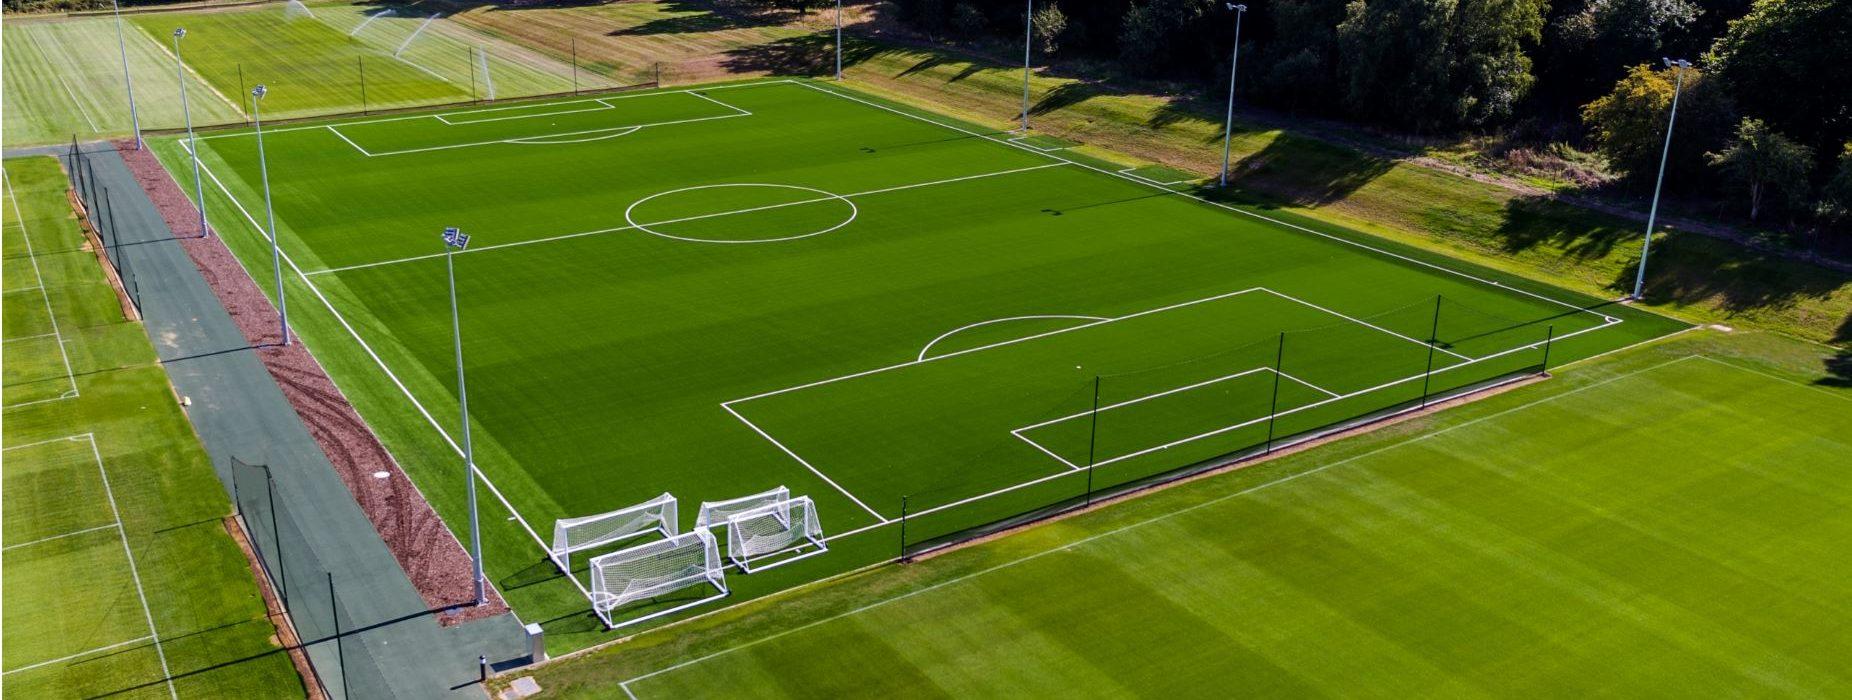 3G pitch at Bearwood Park